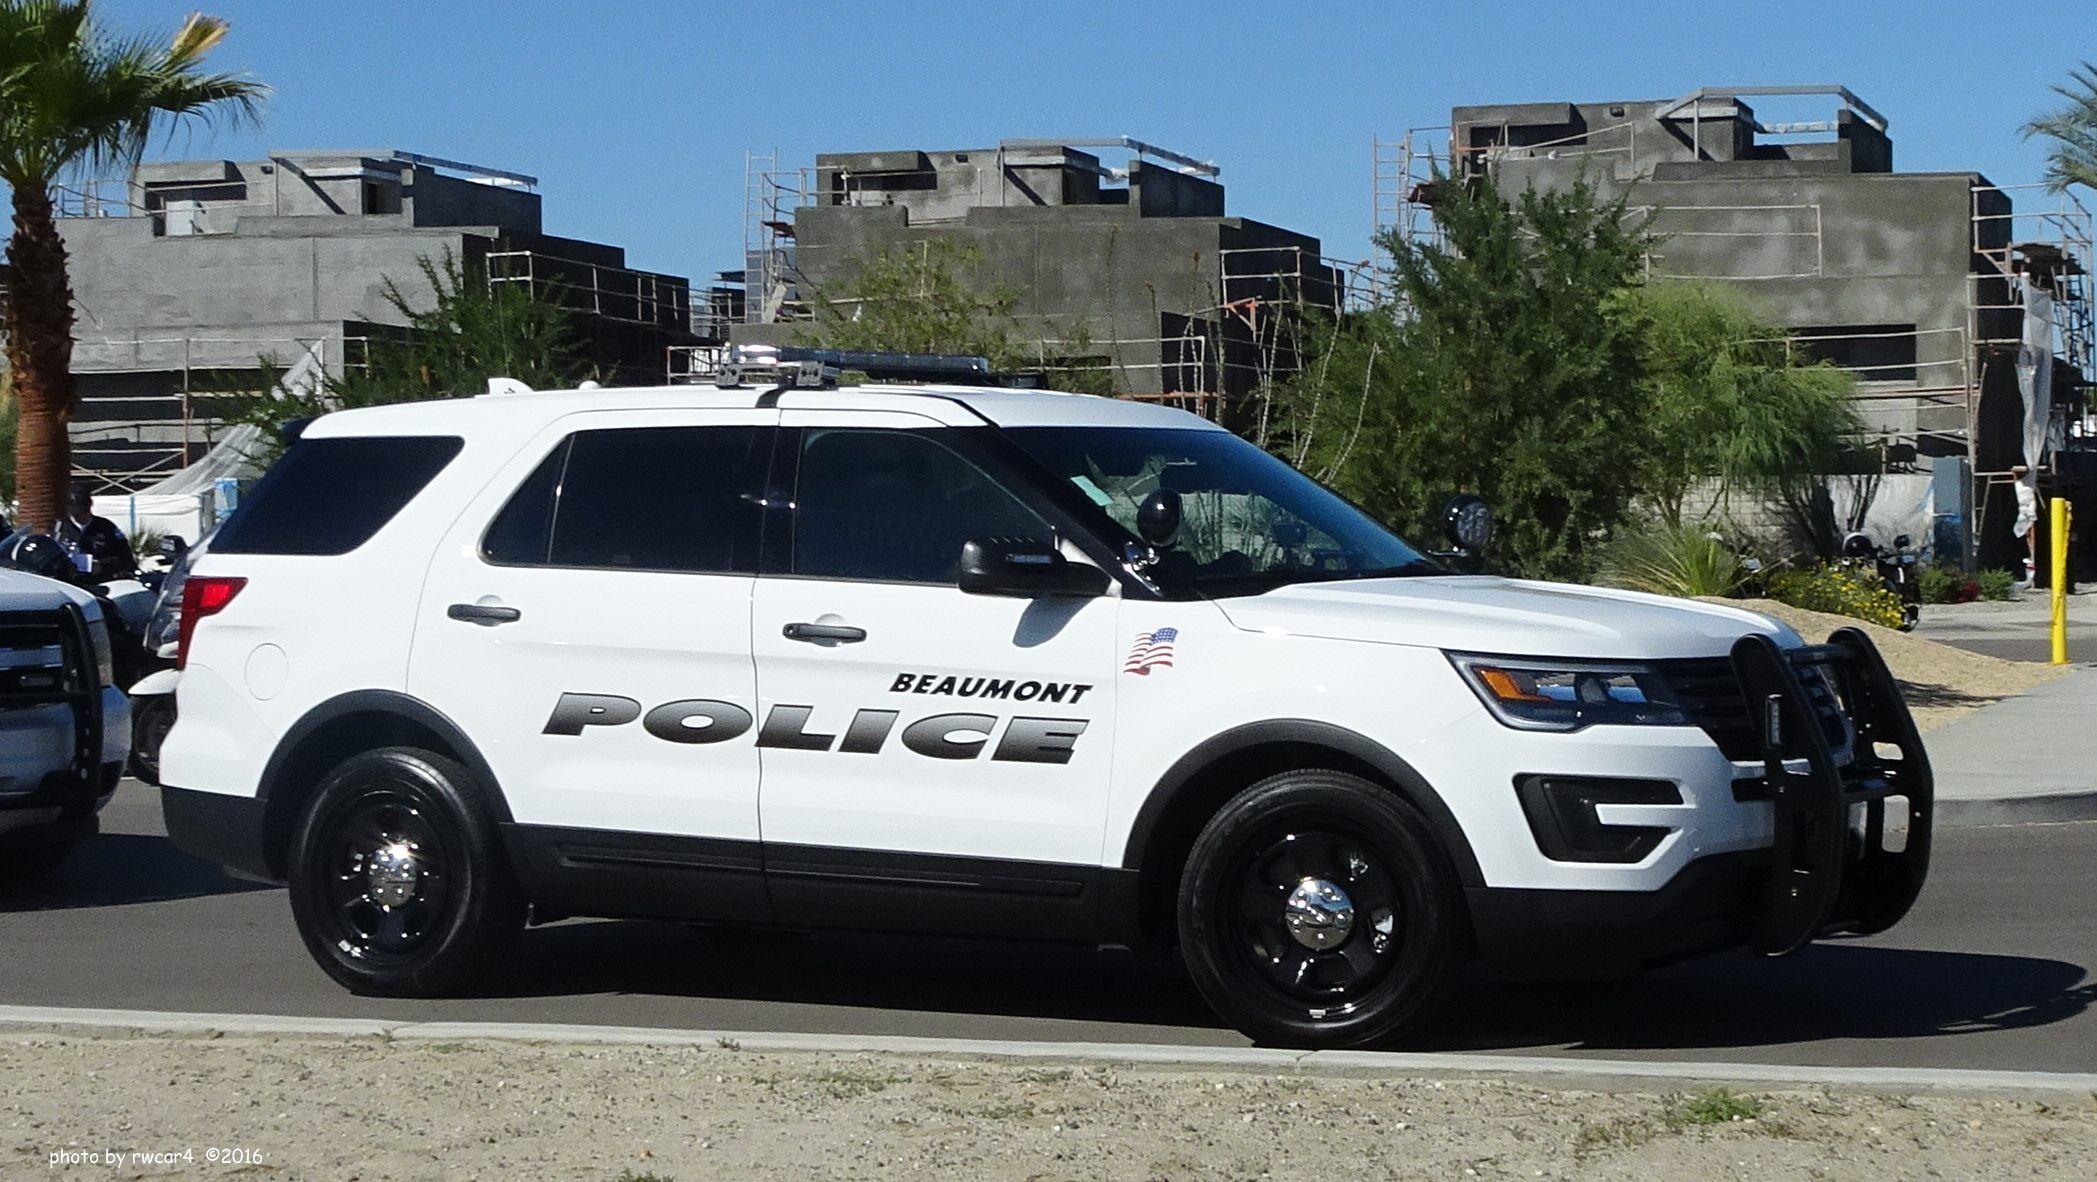 Ca Beaumont Police Dept Police Police Cars Police Dept